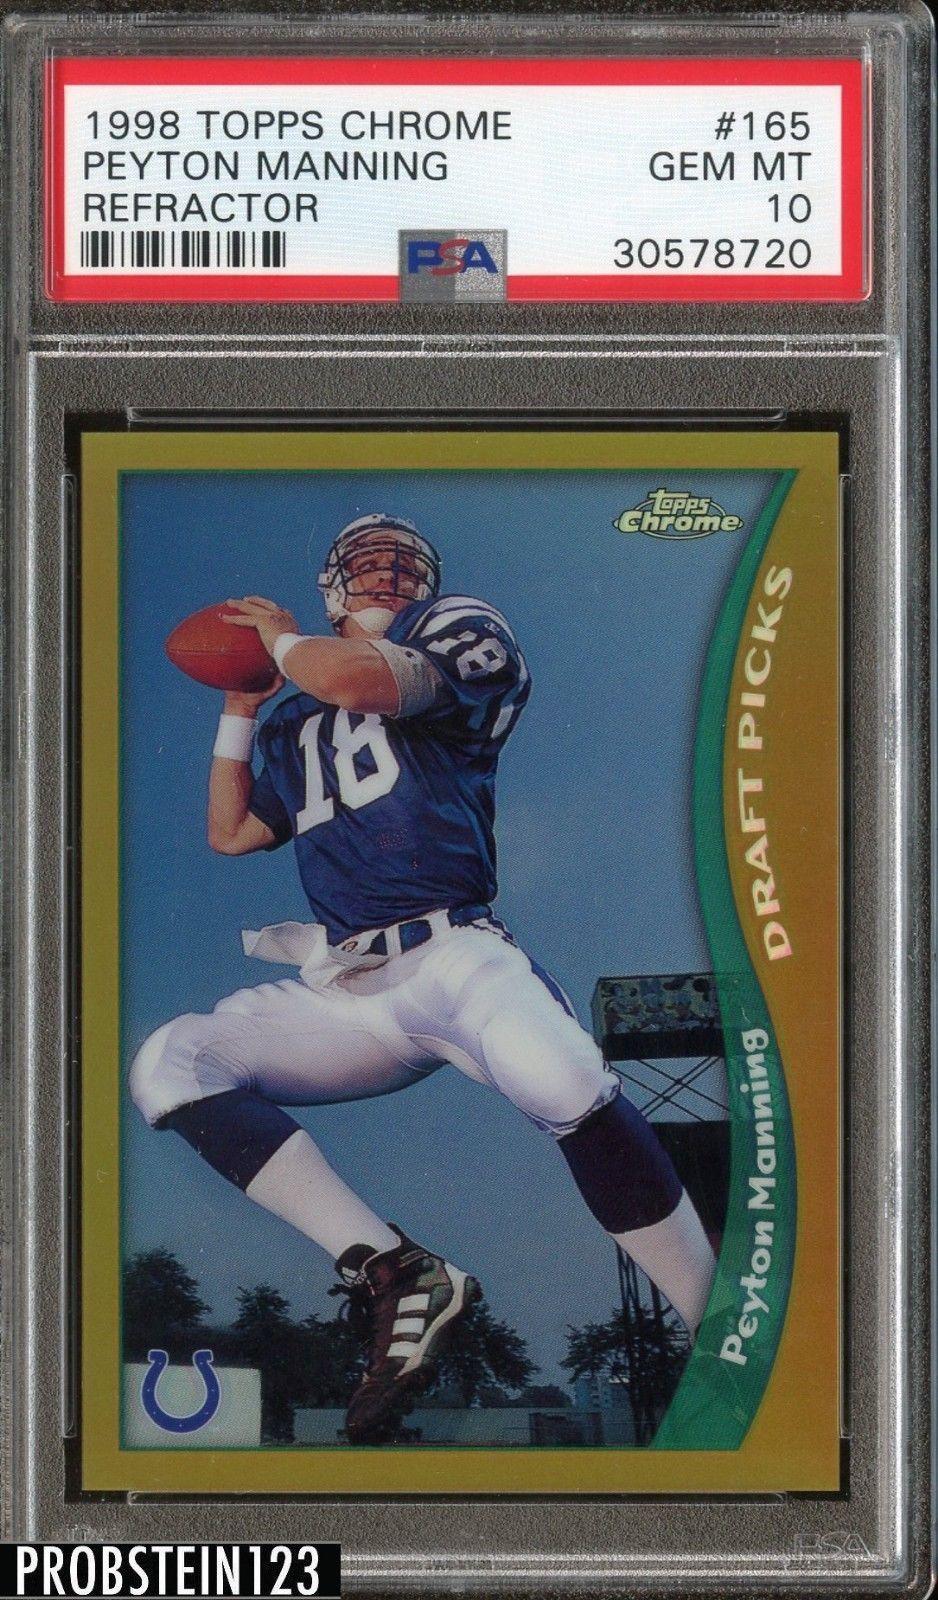 1998 topps chrome refractor 165 peyton manning rc rookie